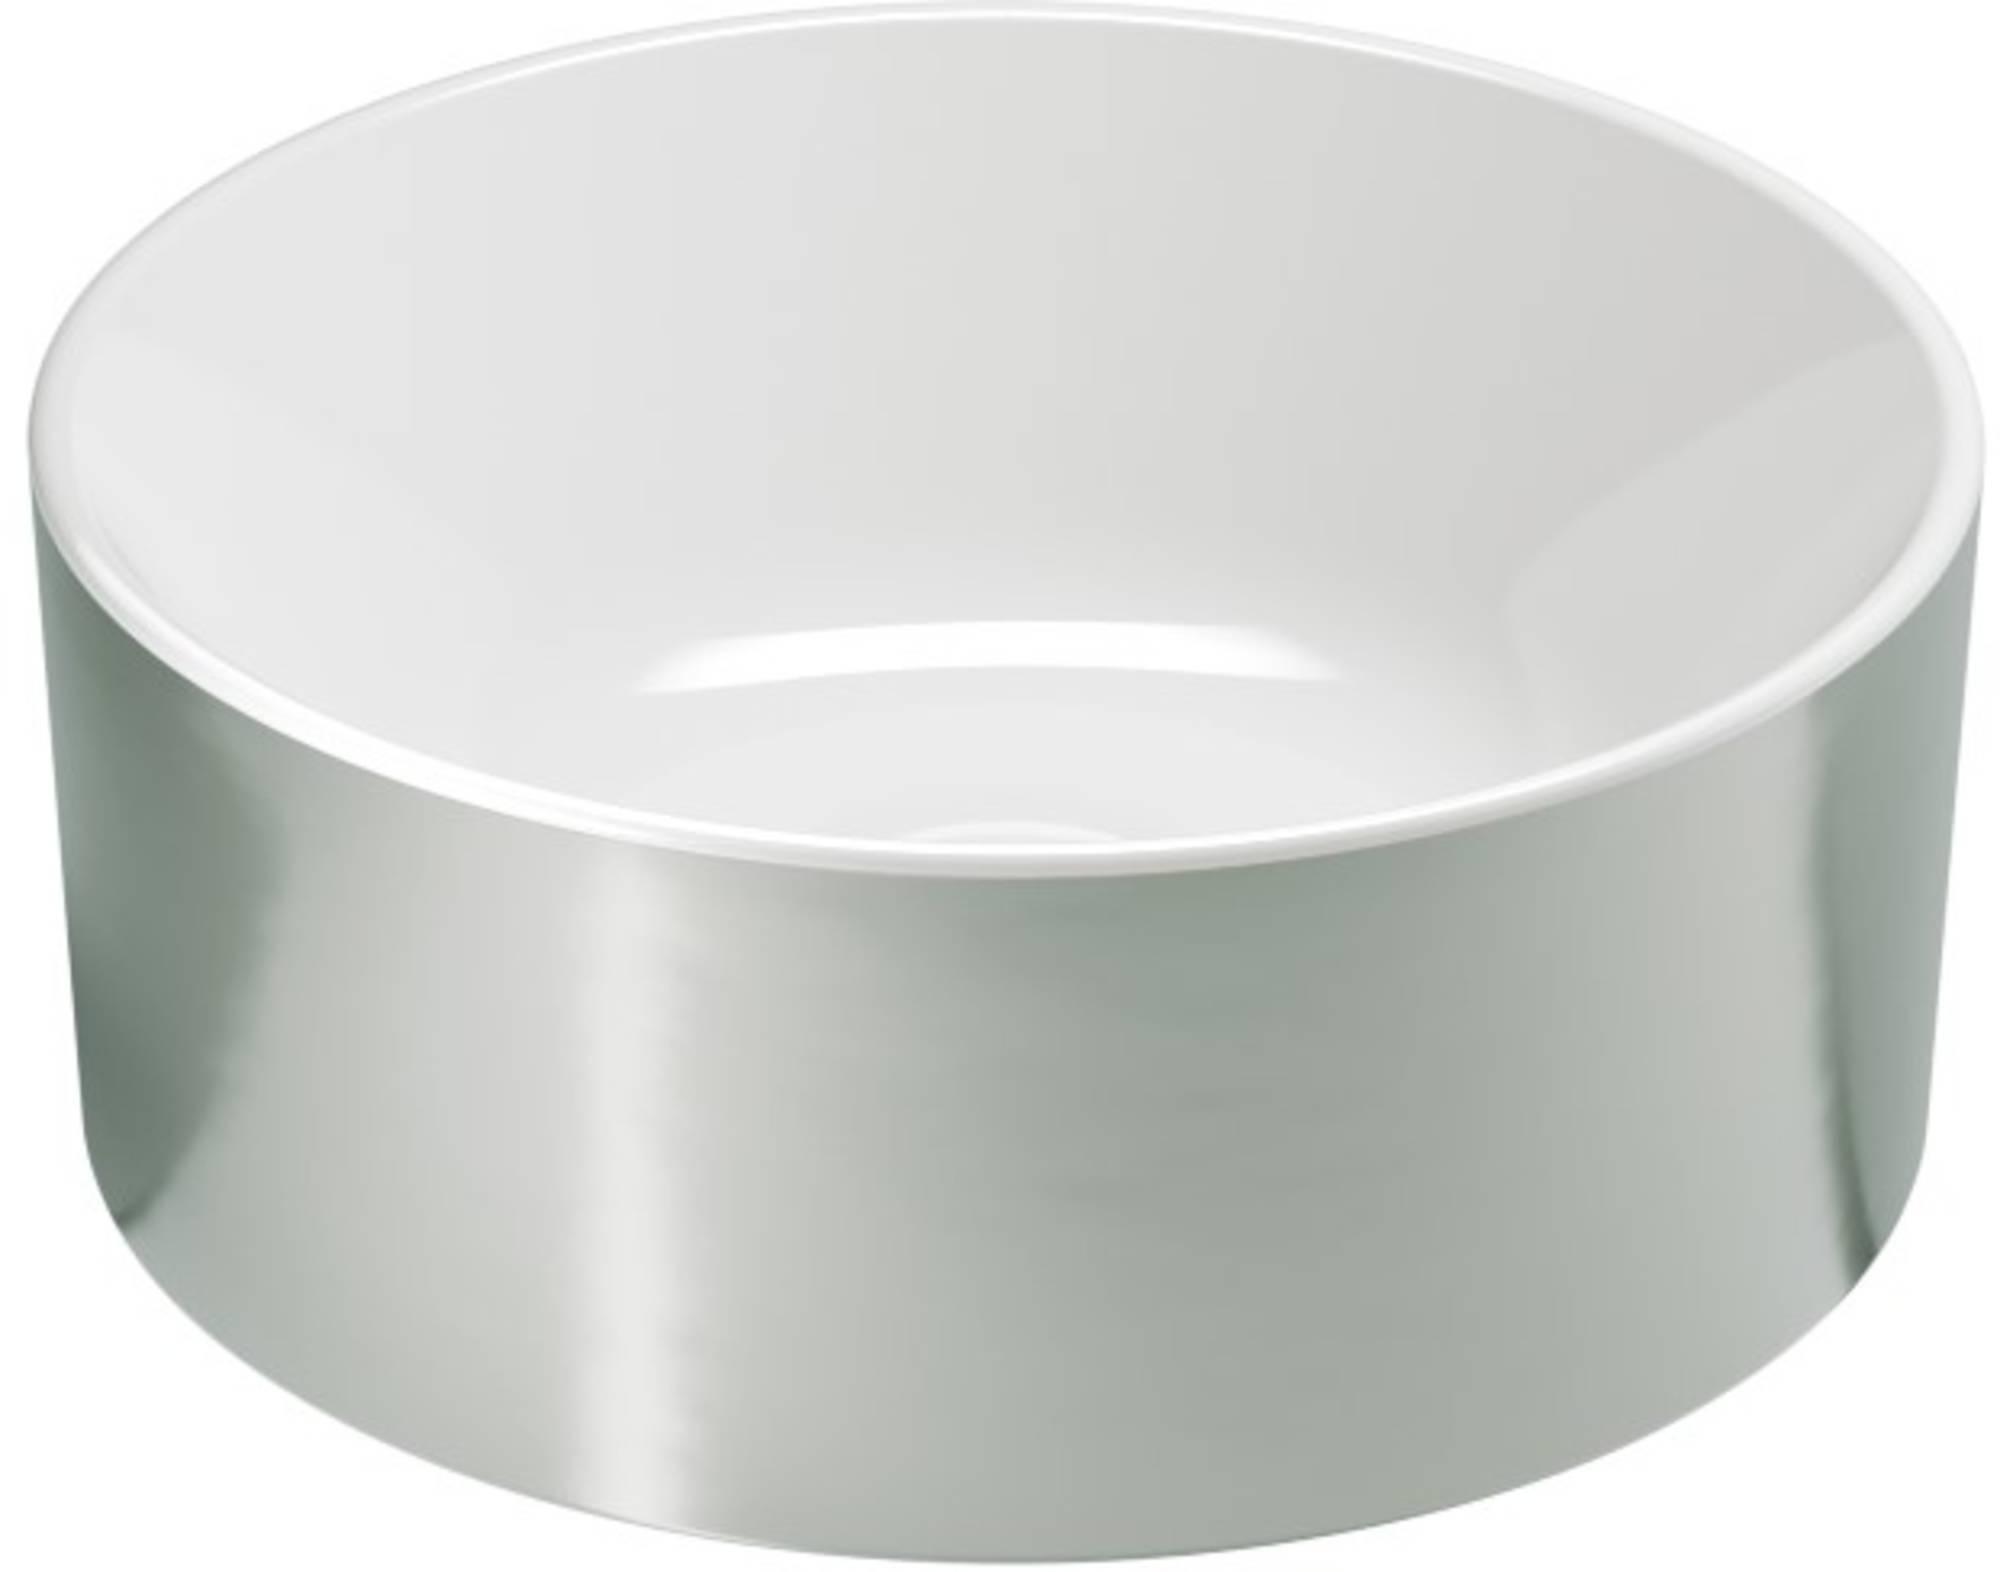 Ben Stelvio Opbouwwastafel Xtra Glaze Ø 32x12 cm Platinum/Glans Wit